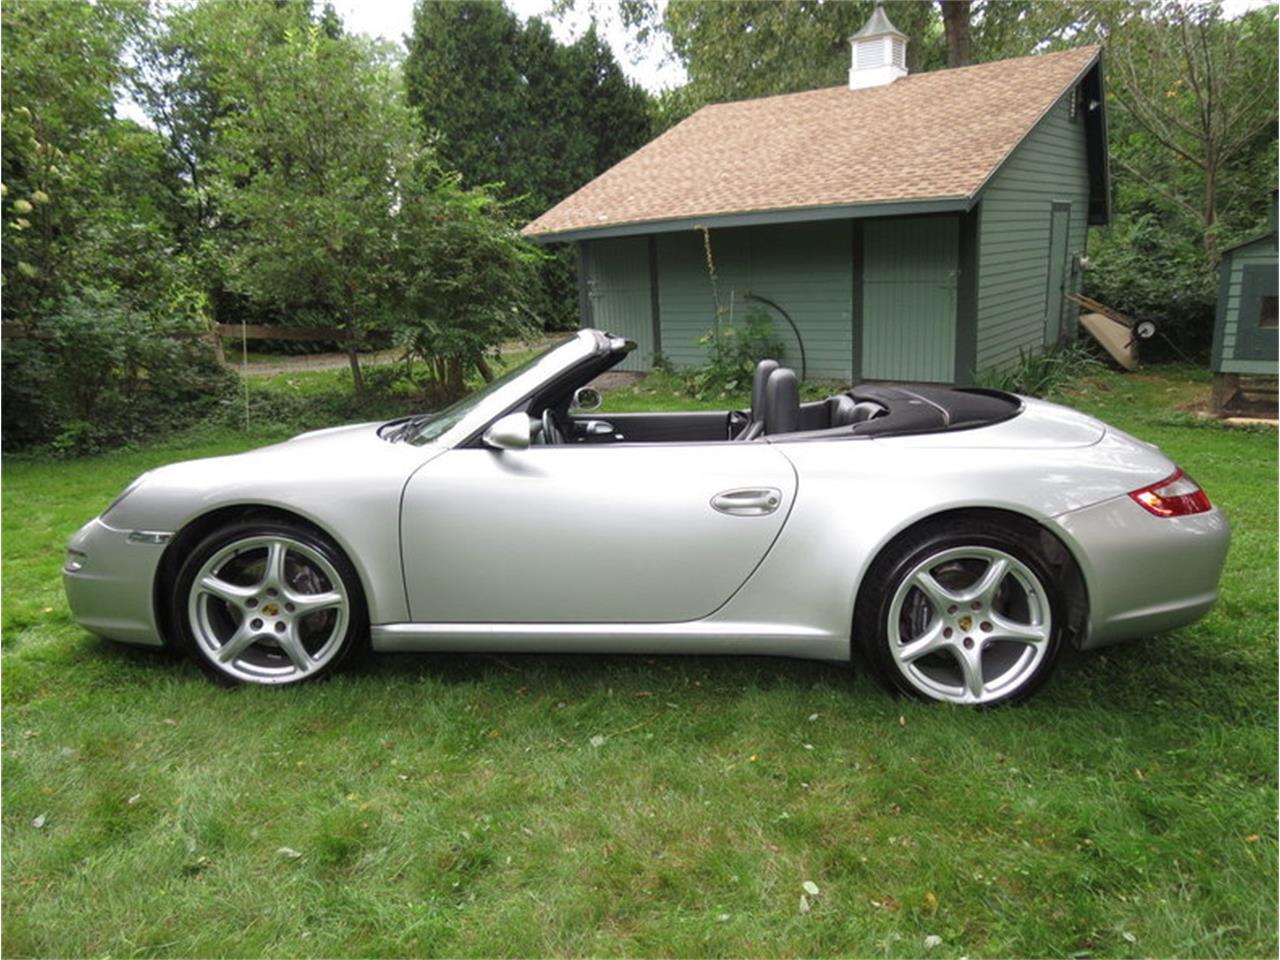 Large Picture of 2005 Porsche 911 Carrera - $29,950.00 - JD2Q